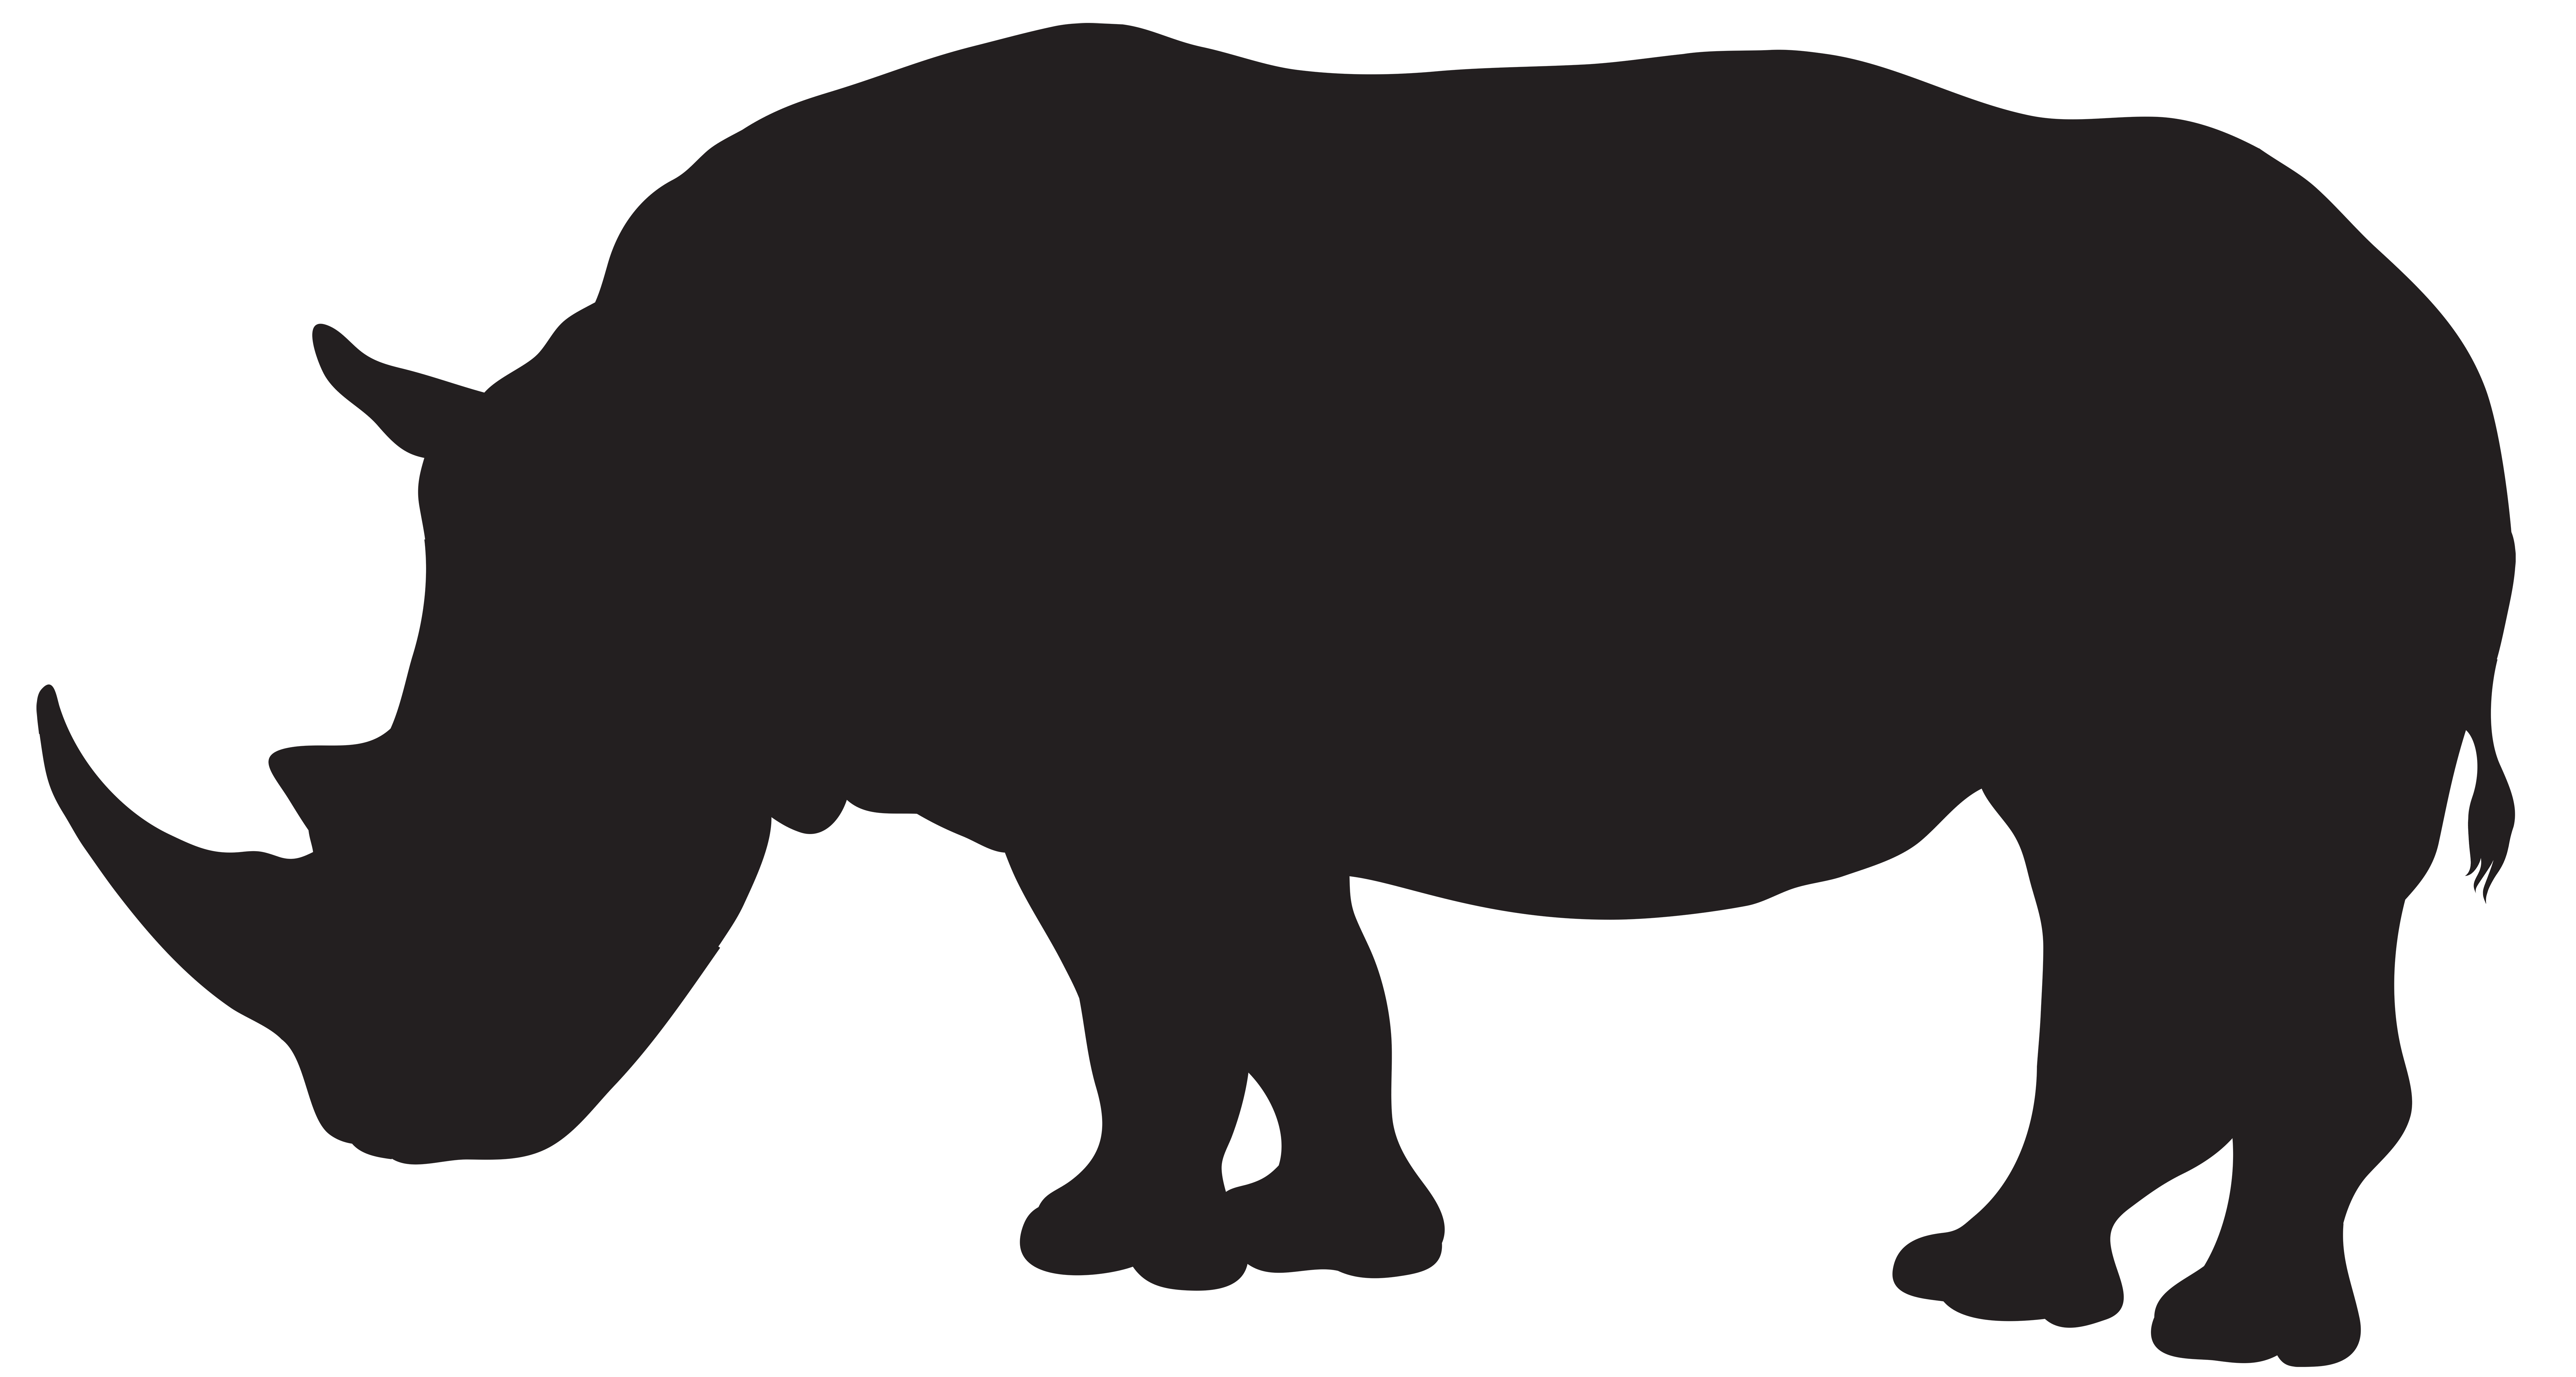 Black vs white rhino clipart freeuse Rhinoceros Silhouette Clip art - Rhino Silhouette PNG Transparent ... freeuse